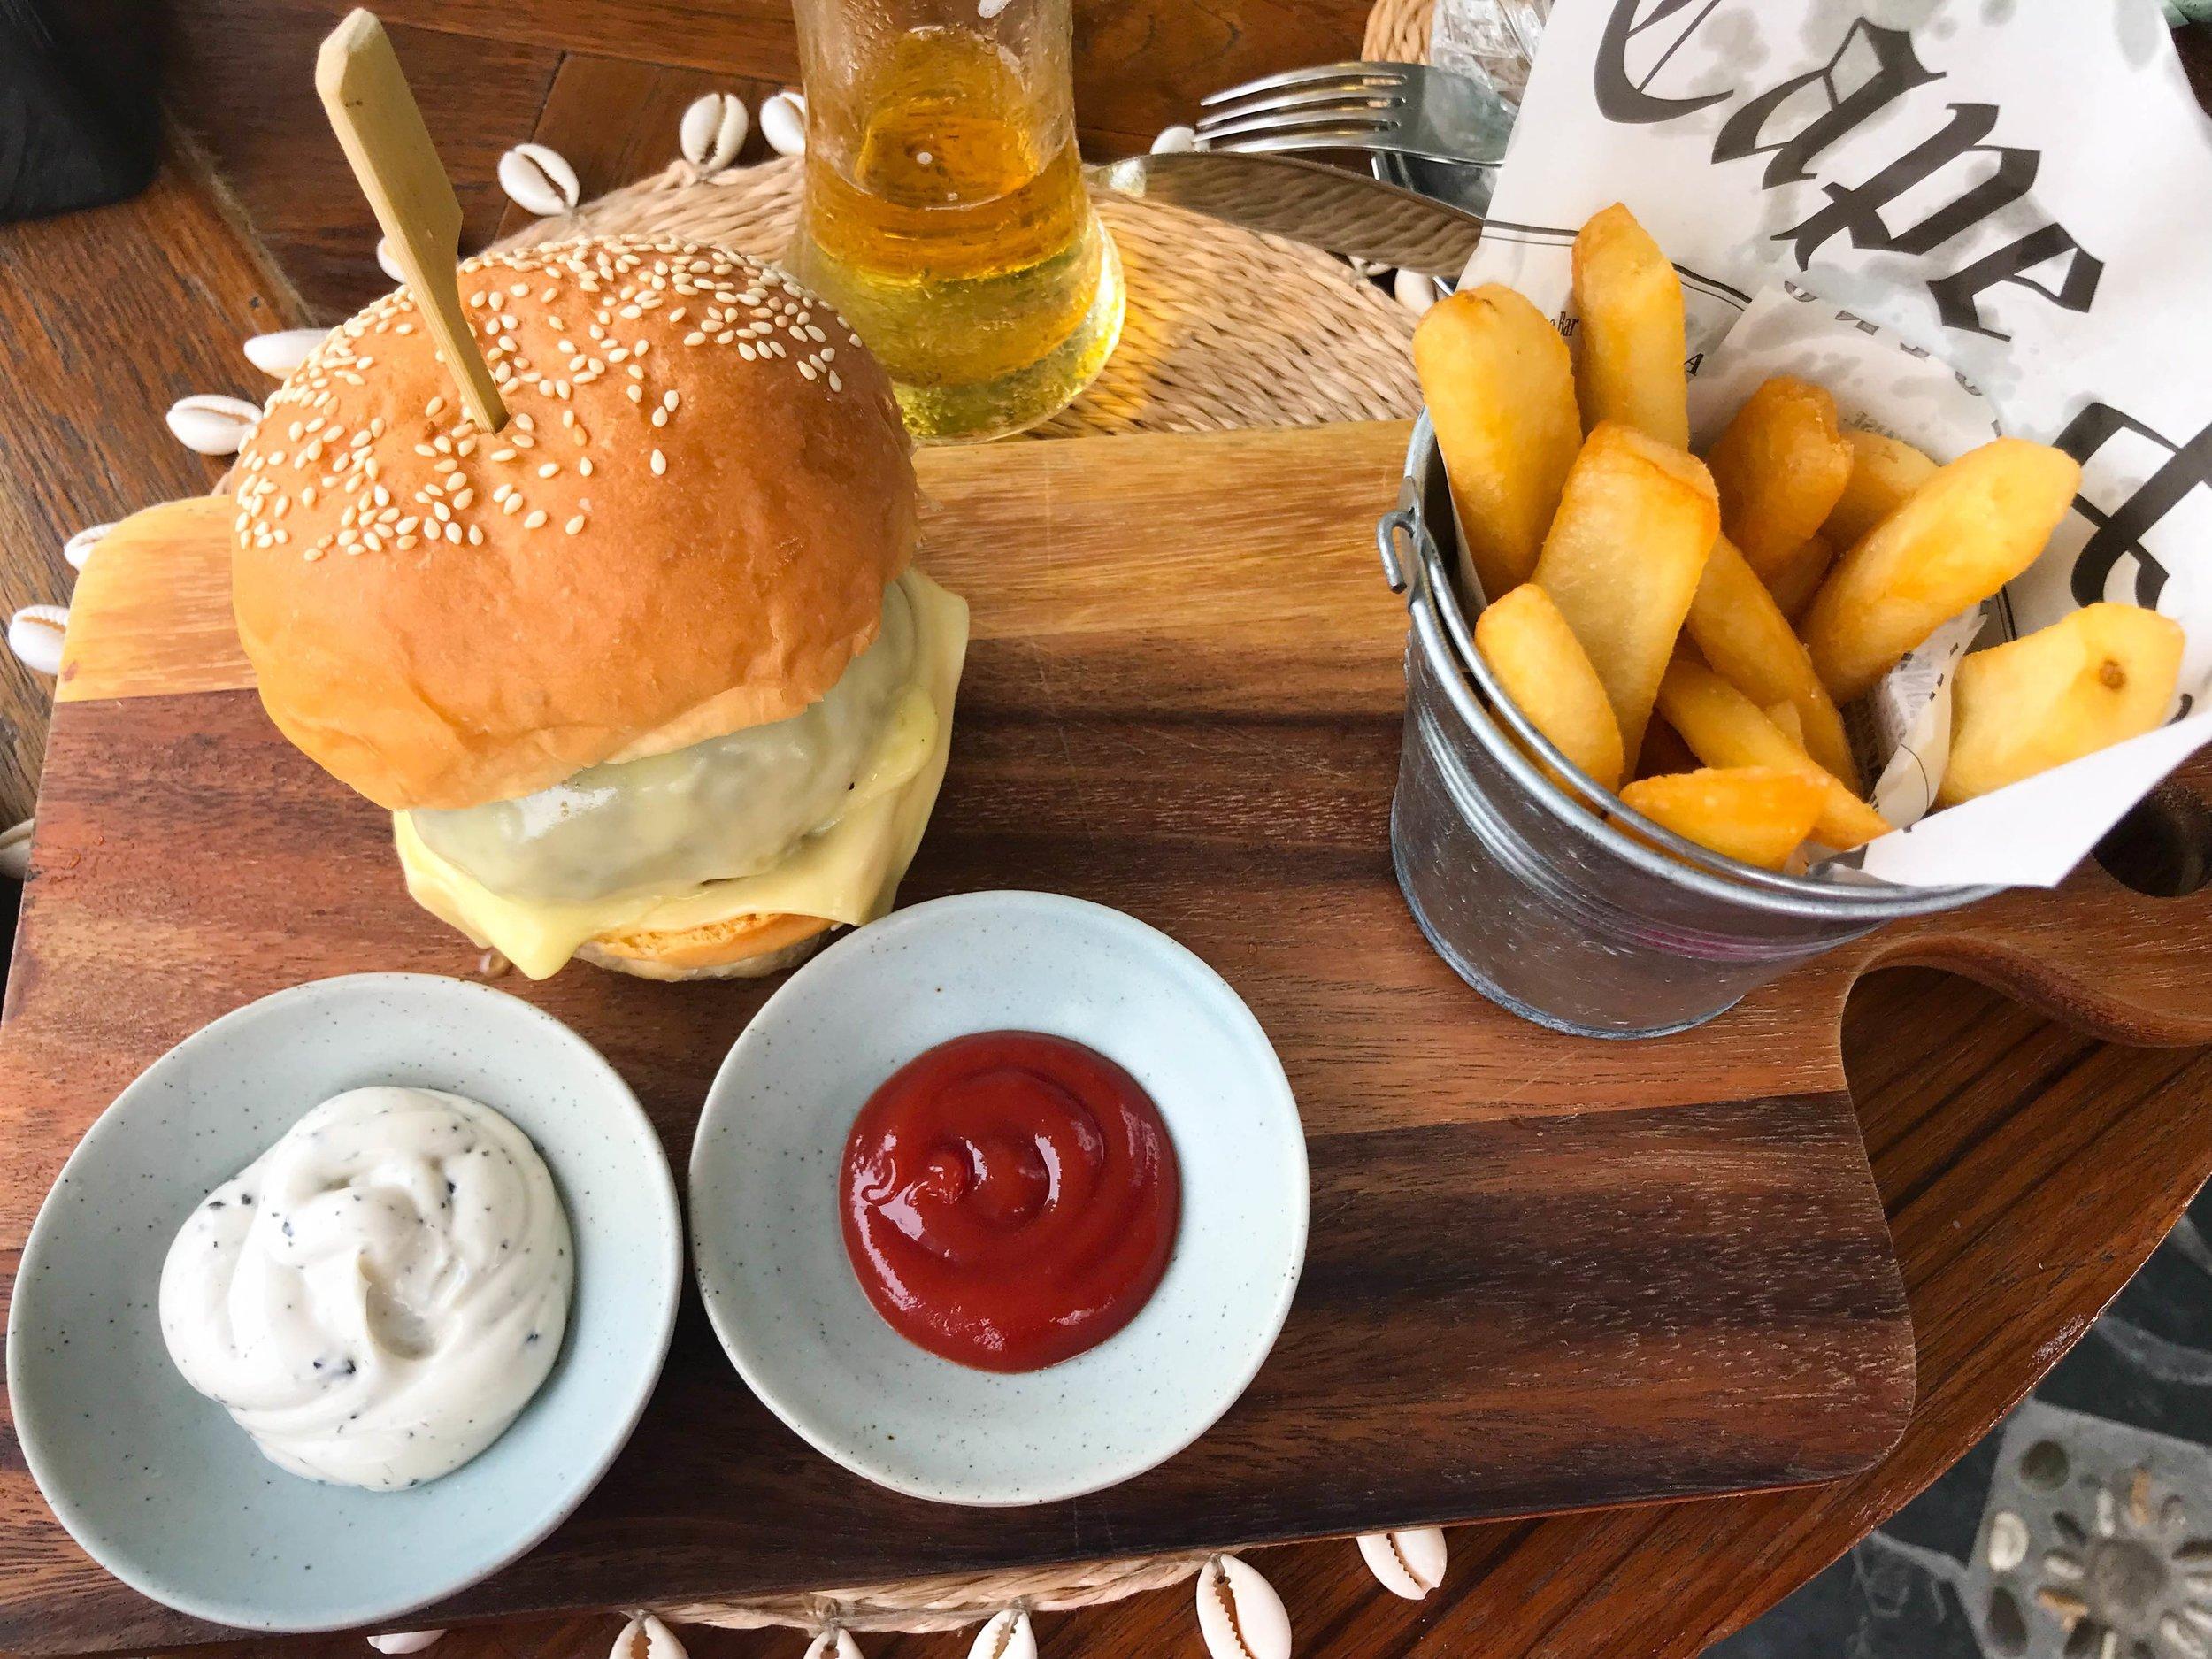 Thailand Cape Kudu Hotel Koh Yao Noi - Best Burger and Fries